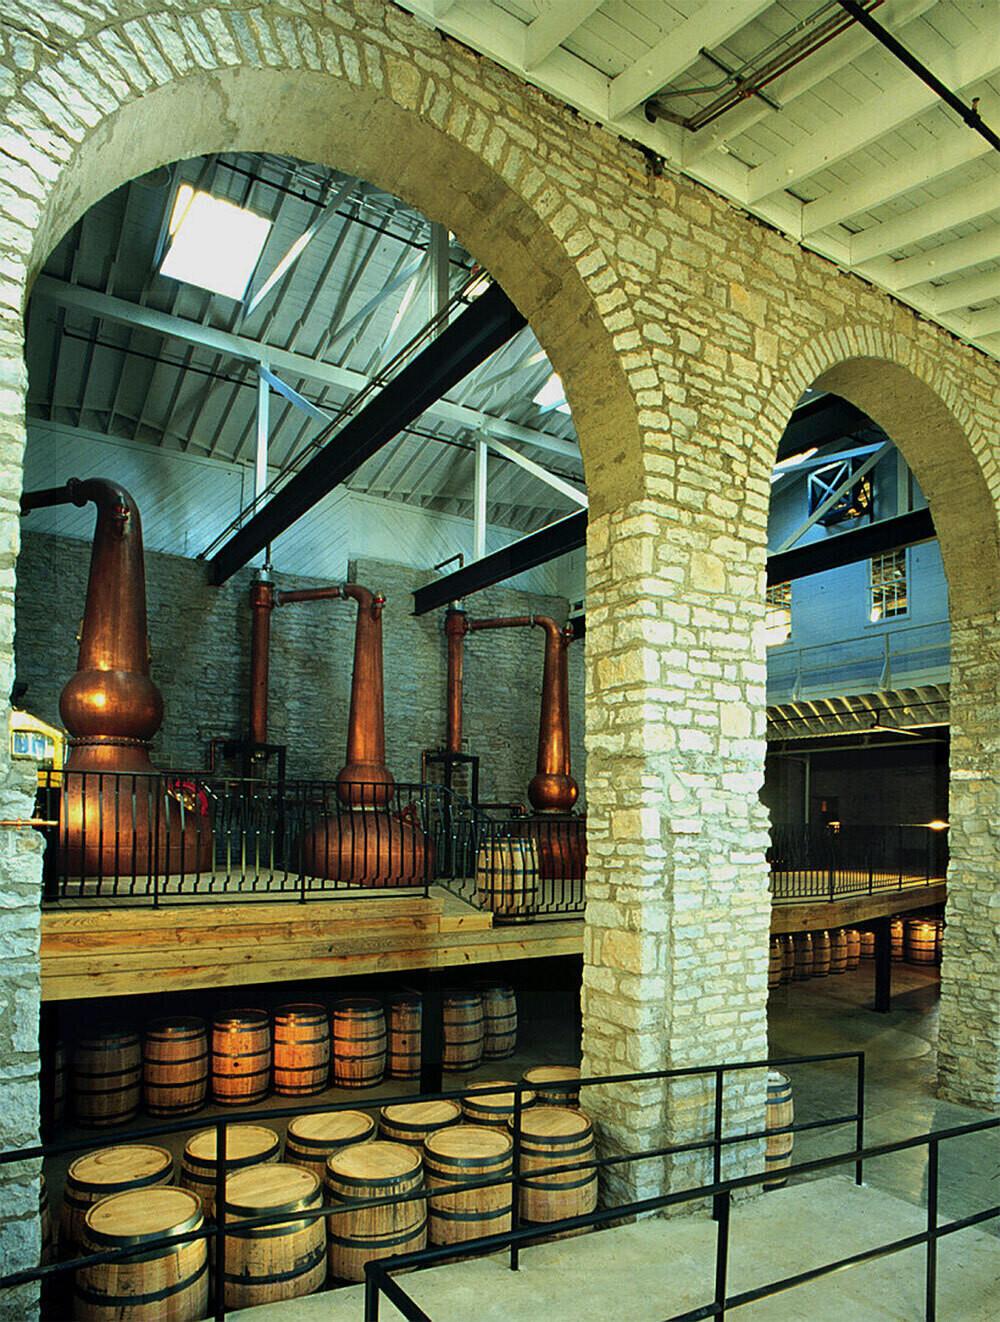 woodford-reserve-distillery-barrel-warehouse-stills-tour